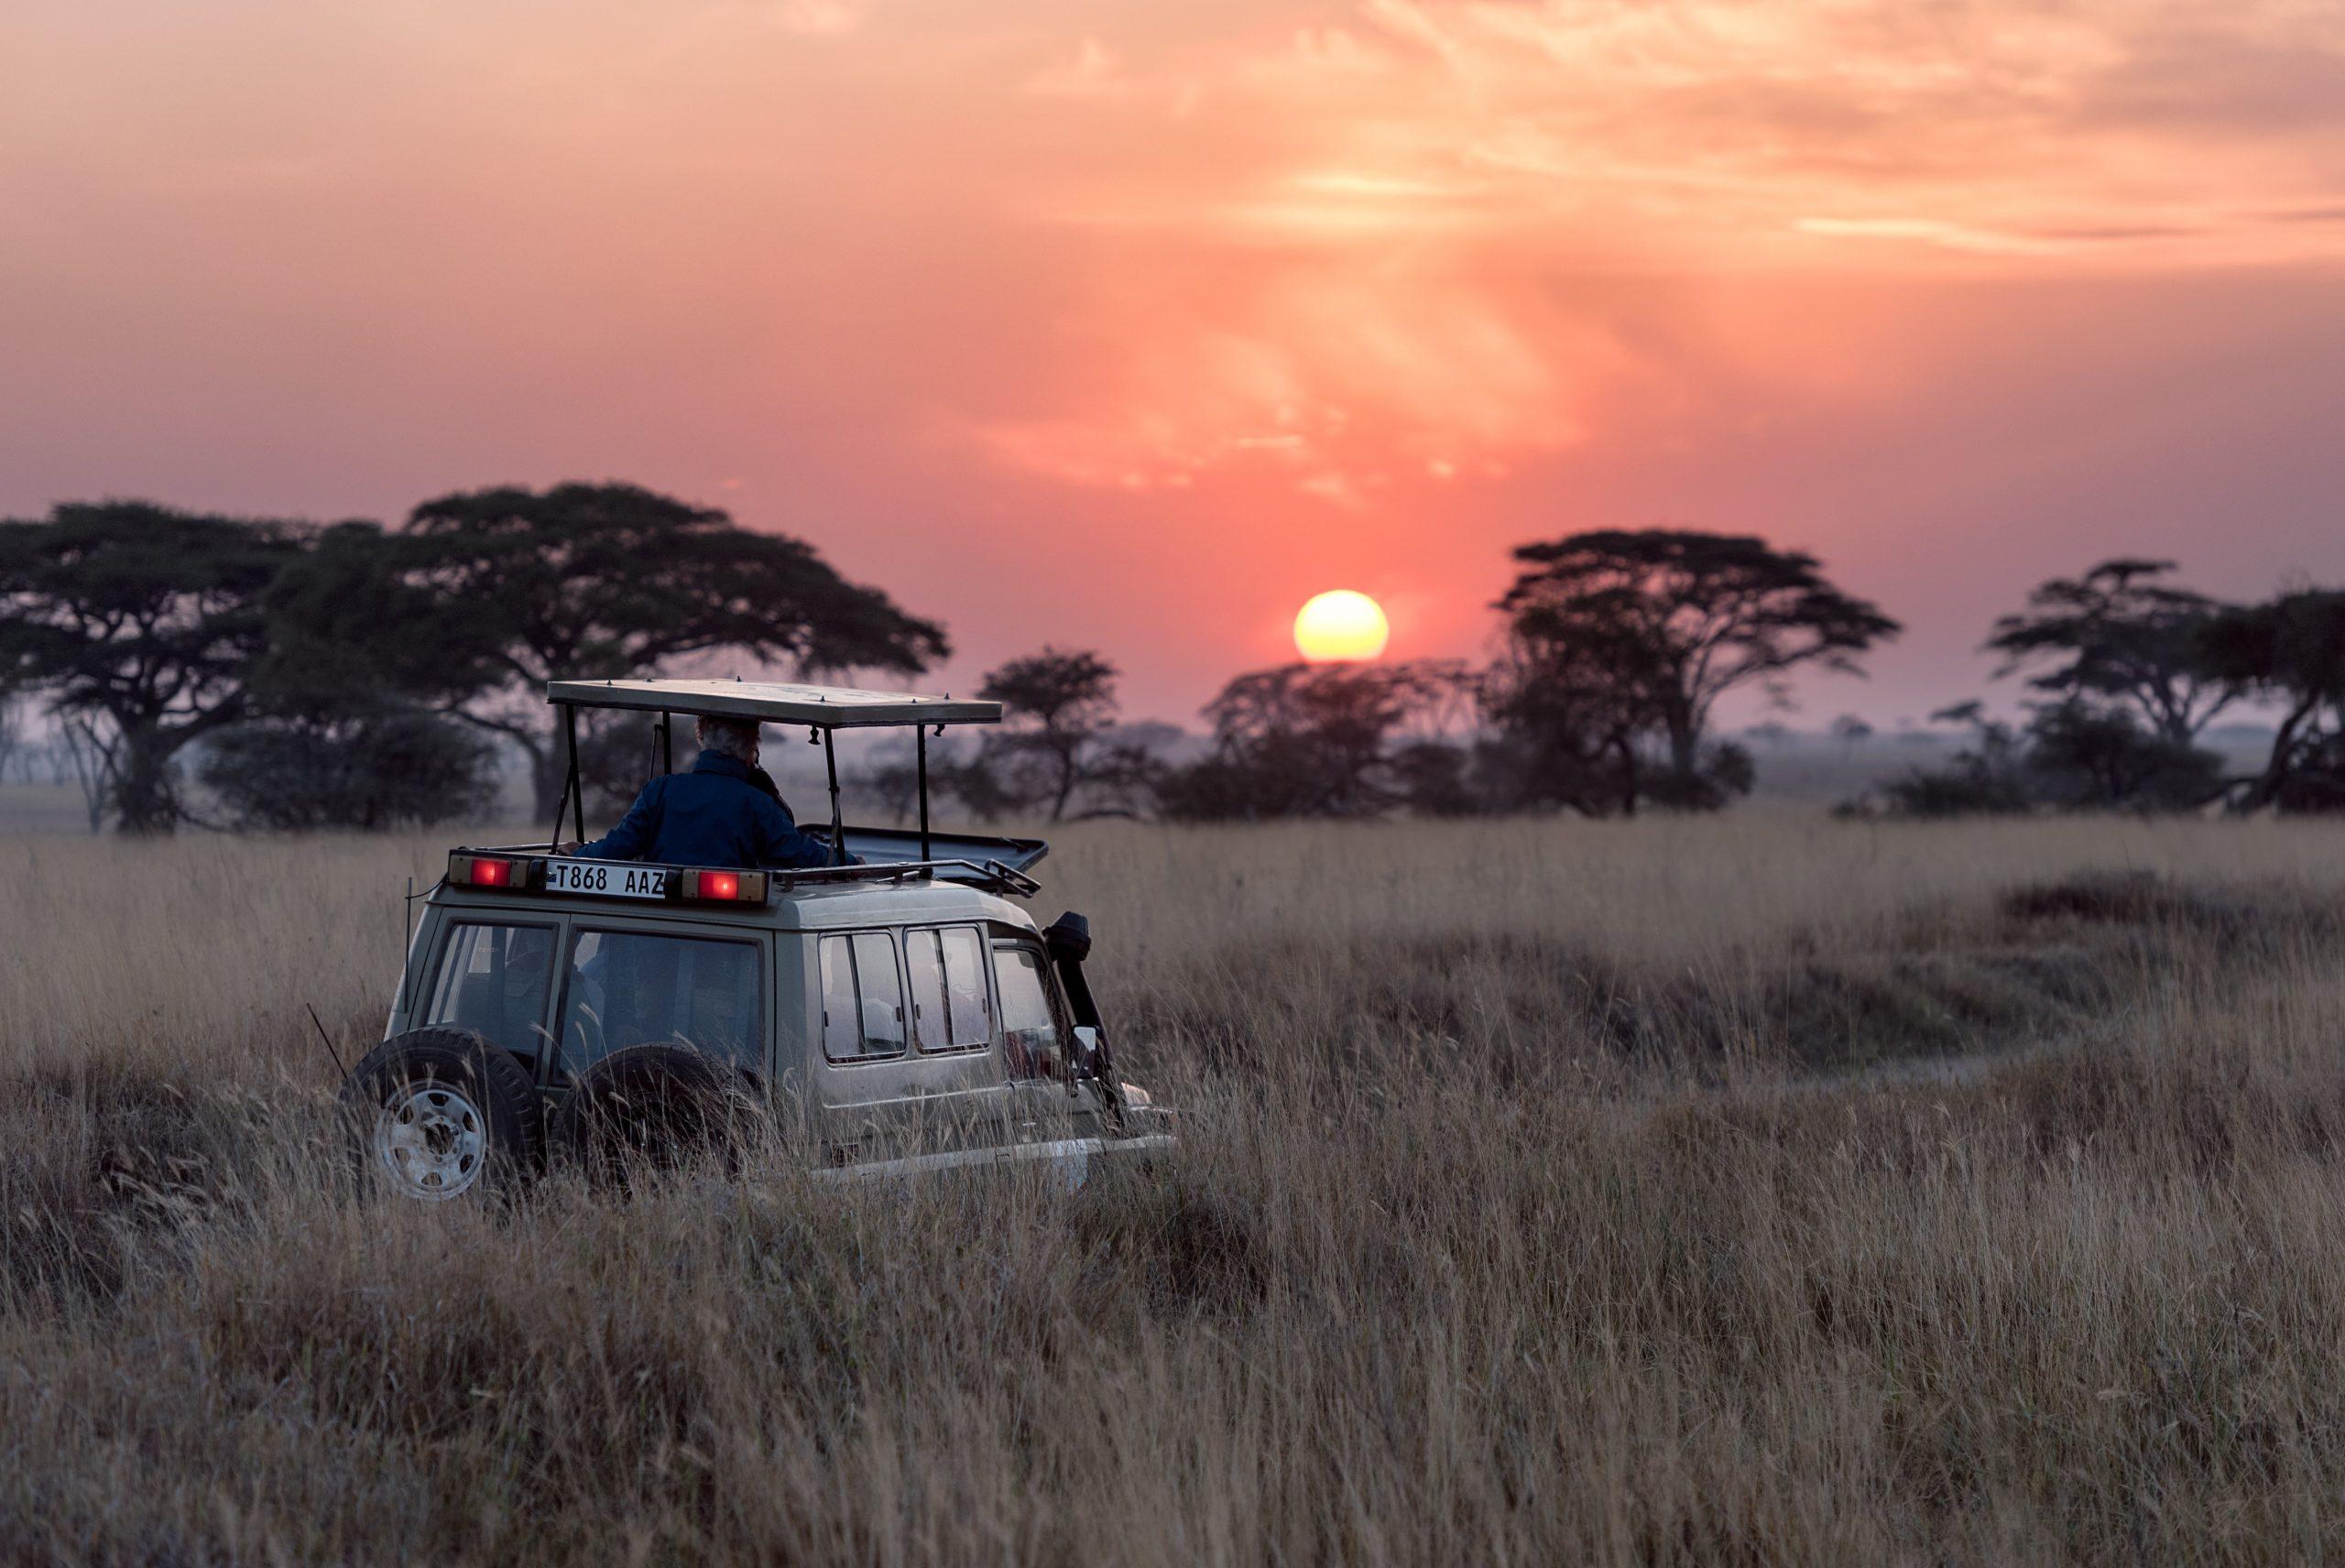 Plan safari in advance